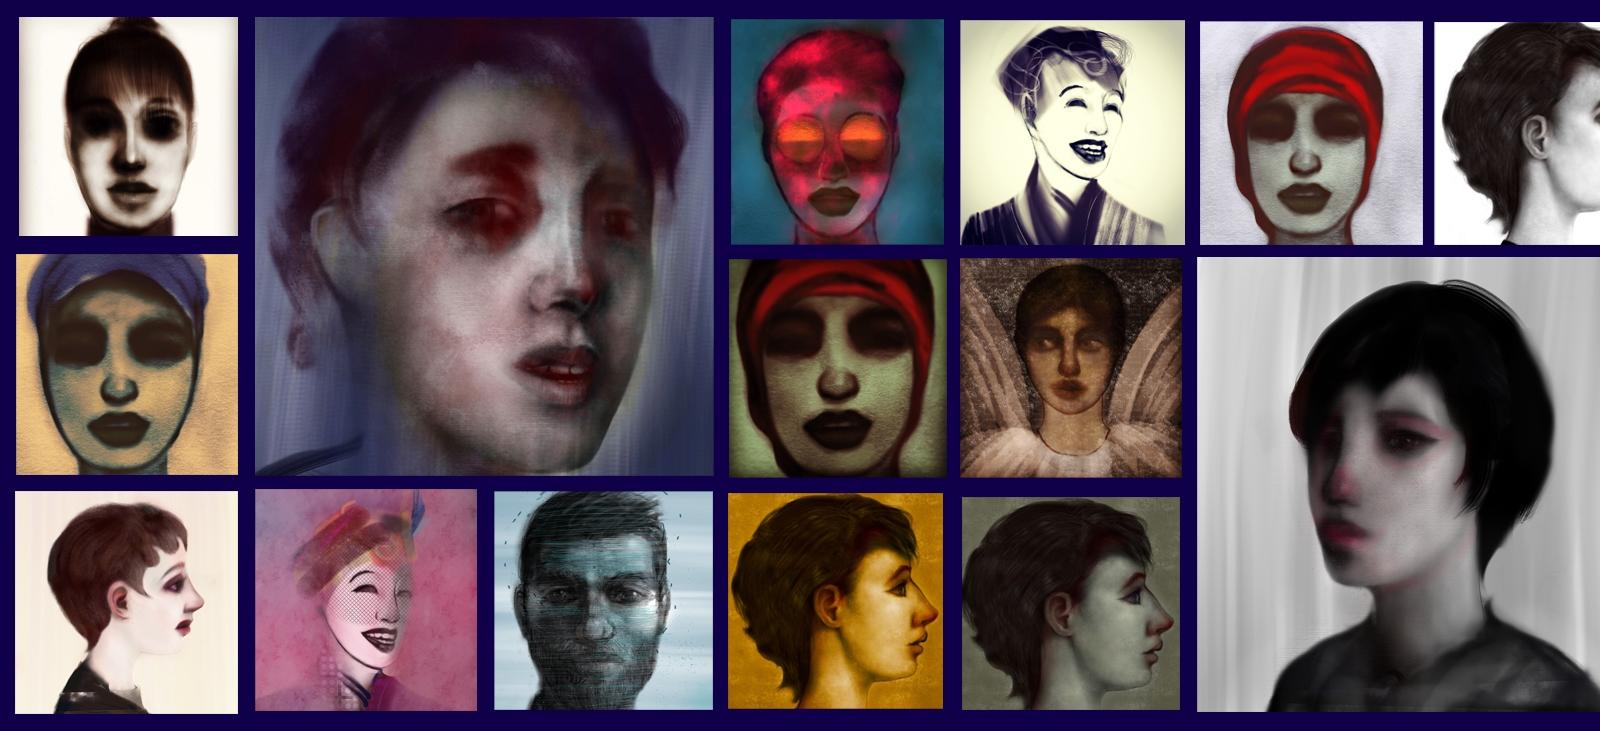 Digital artwork by Mike Chambers